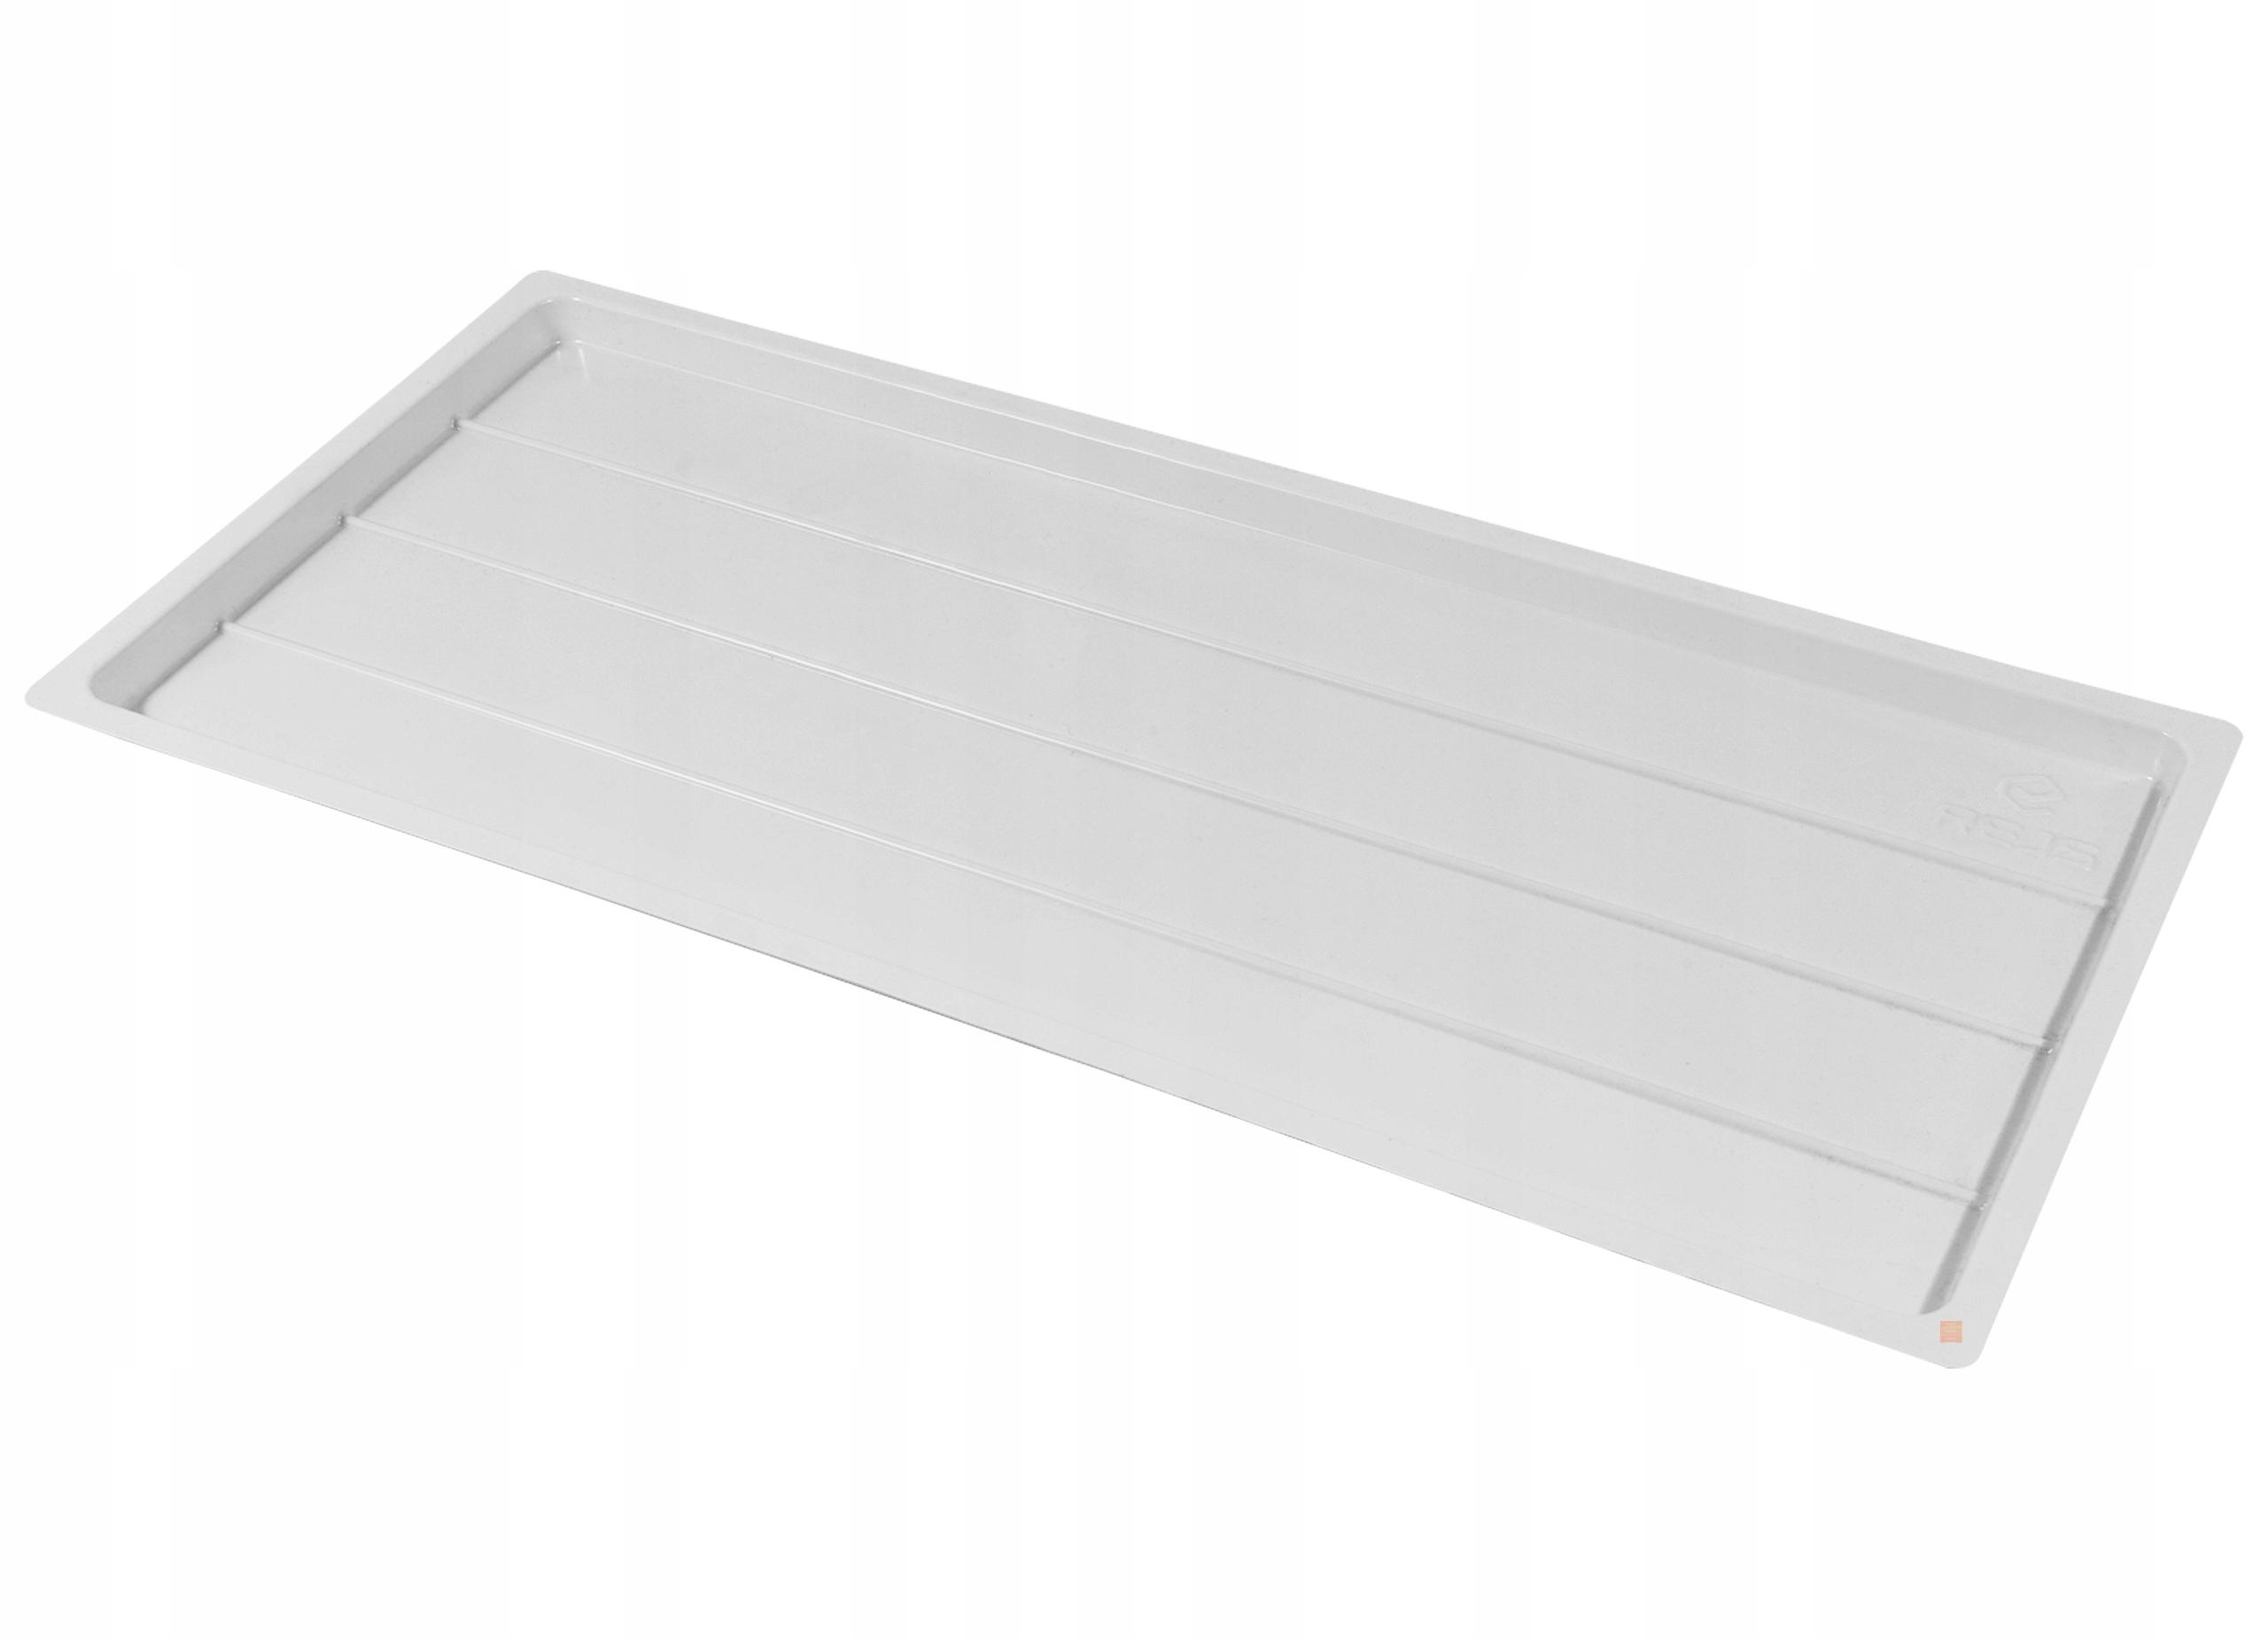 Tray Туалет лоток для шкафа 80см белый